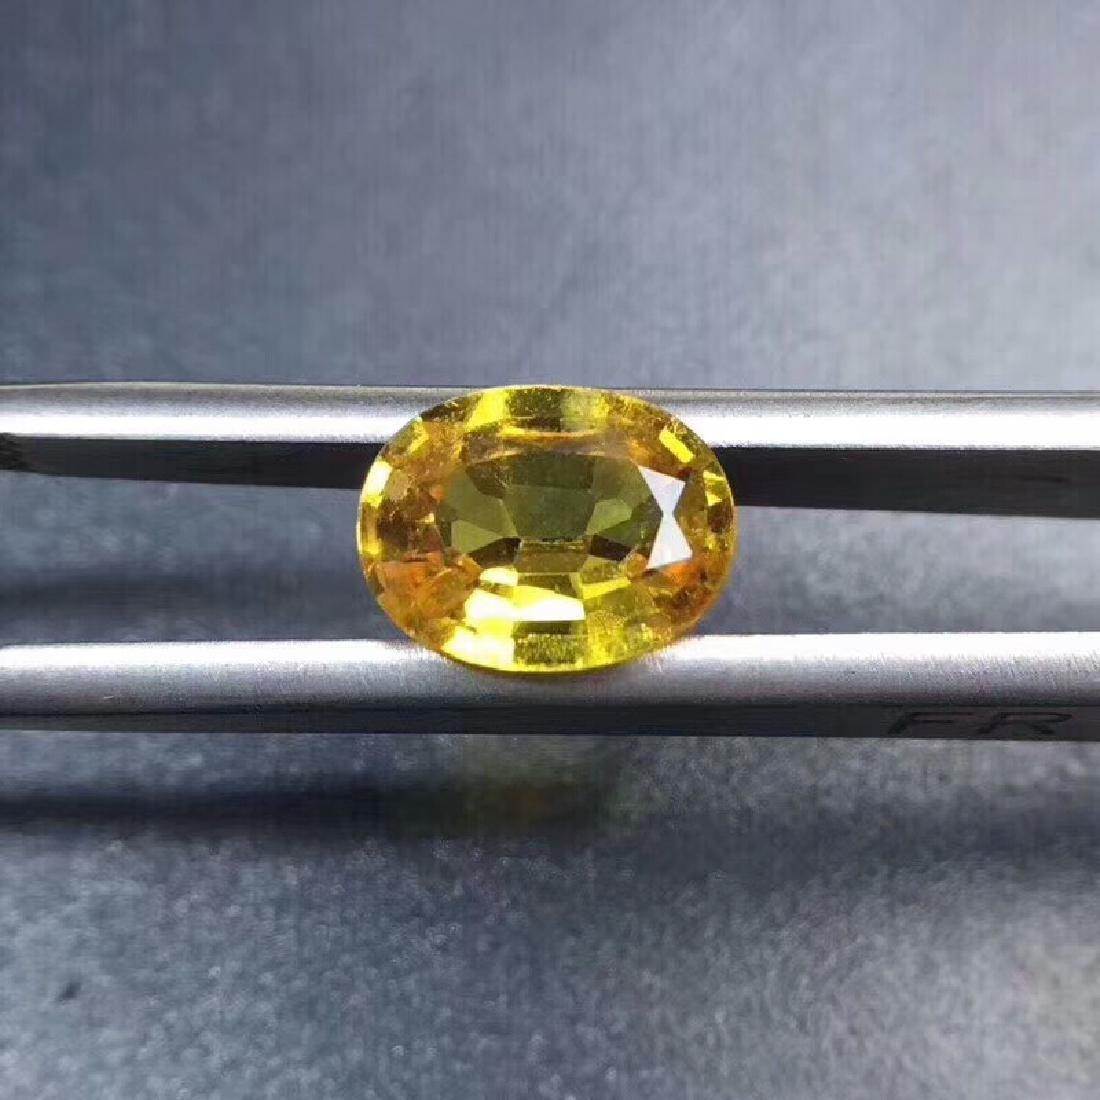 1.8 ct Yellow Sapphire 7.0*9.1 mm Oval Cut